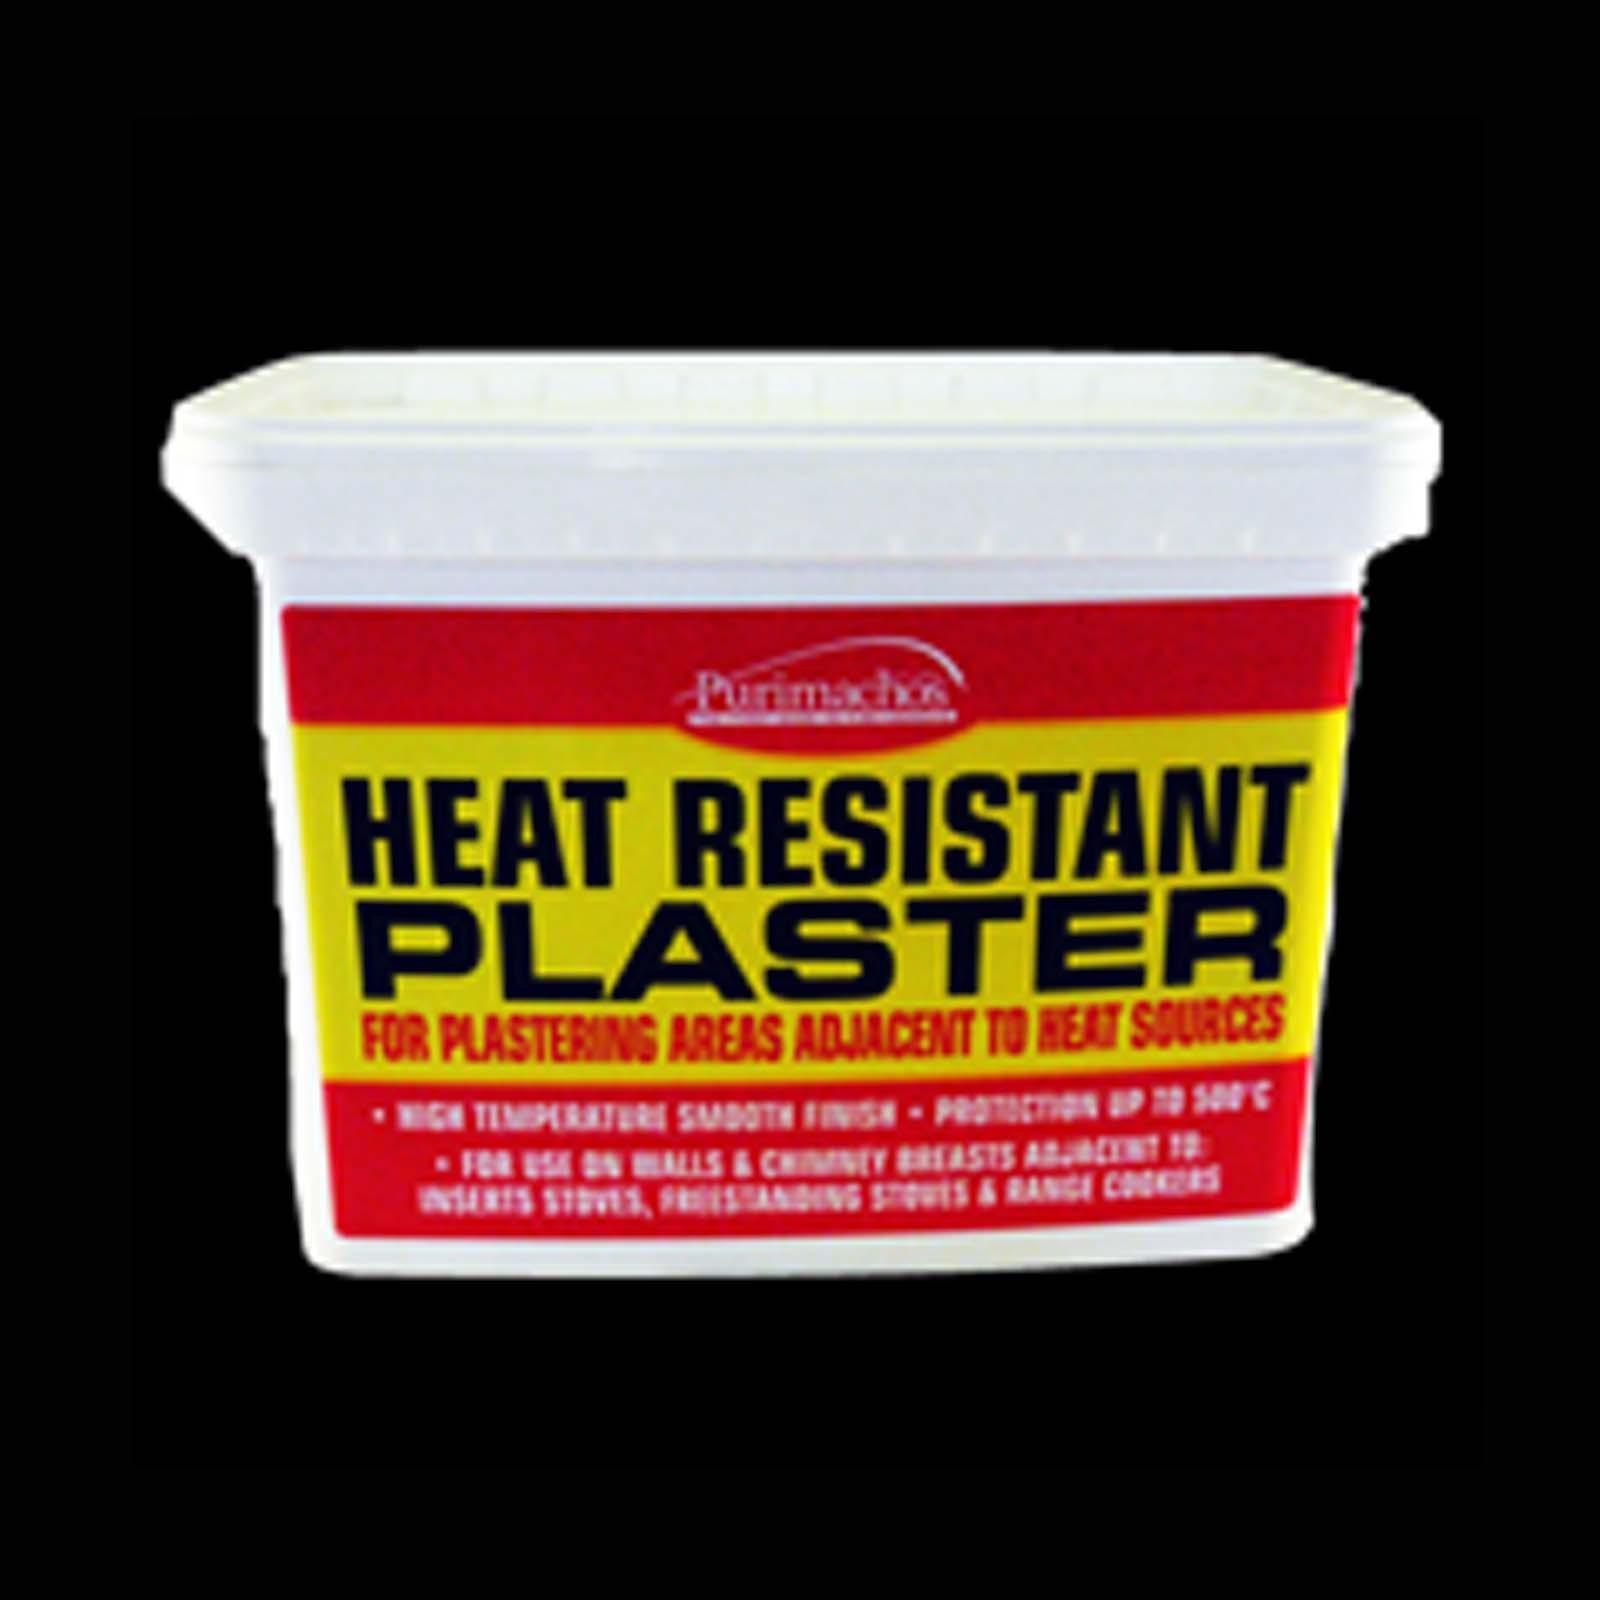 Fire Resistant Plaster : Incredible value gallery heat resistant plaster kg